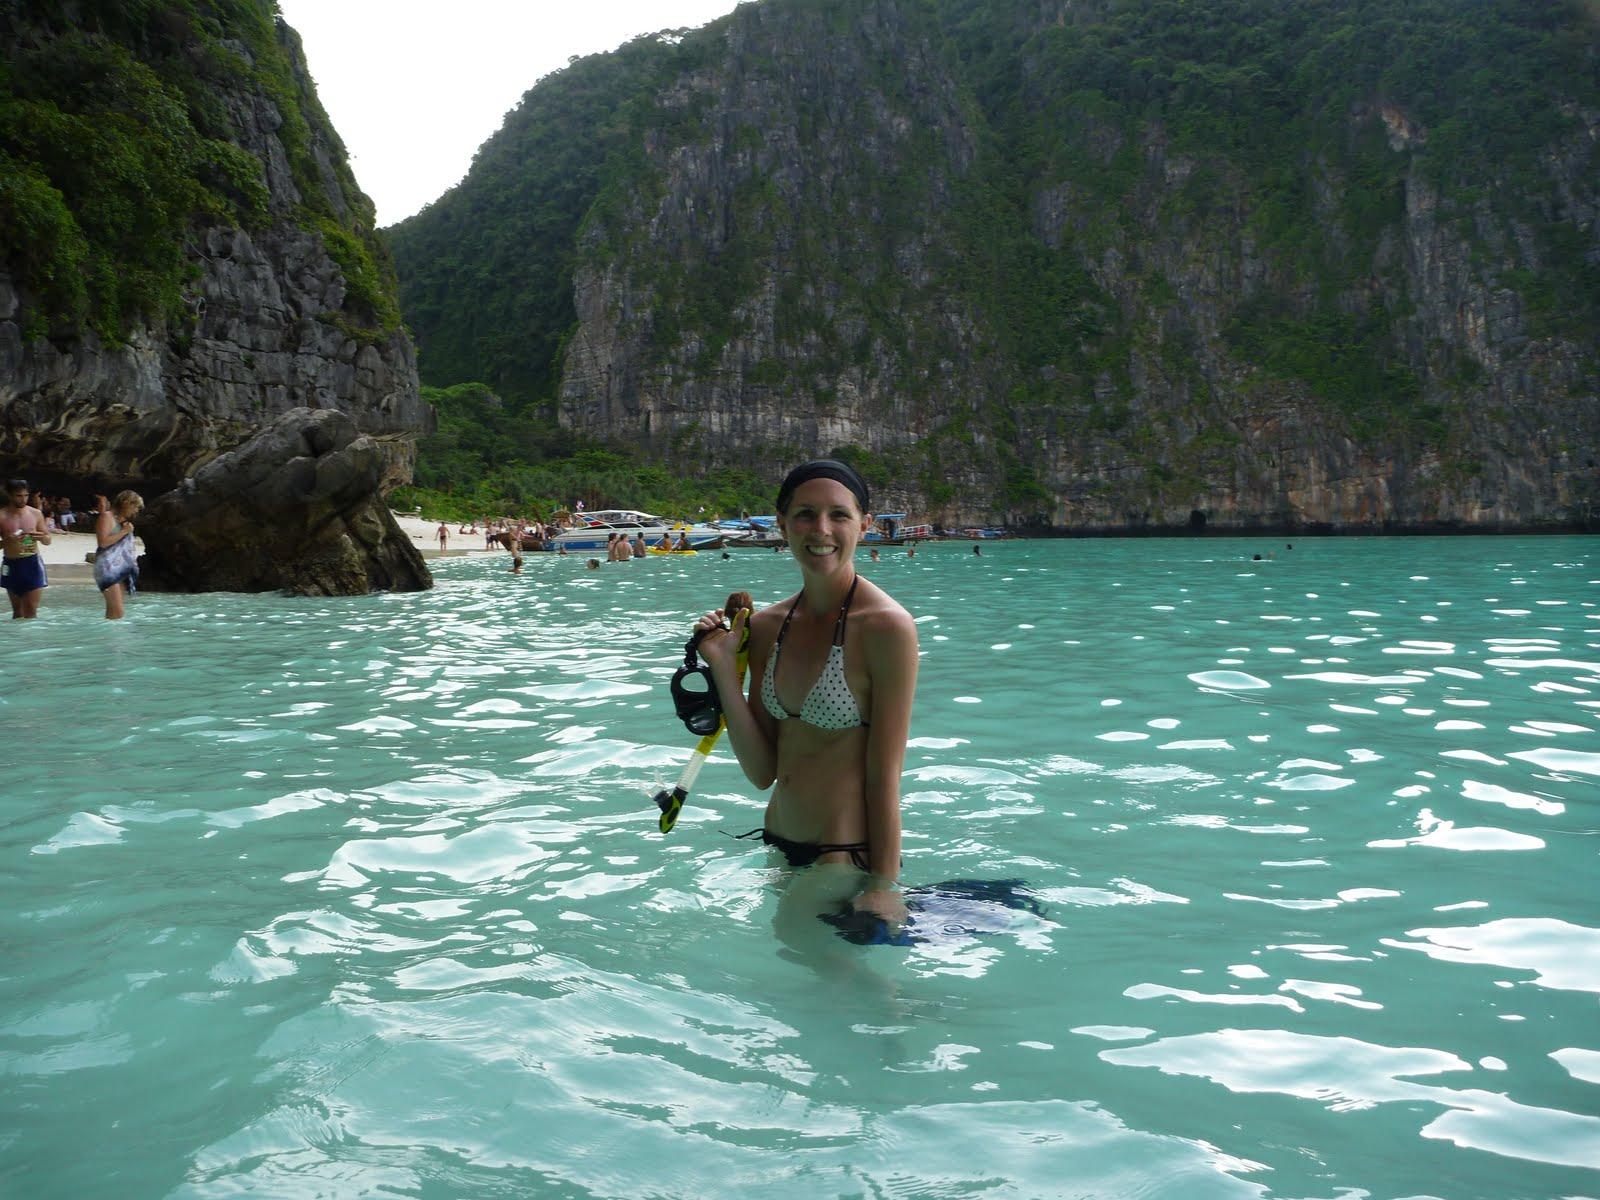 Thailand Trip!: Snorkeling and Scuba Diving in Koh Phi Phi